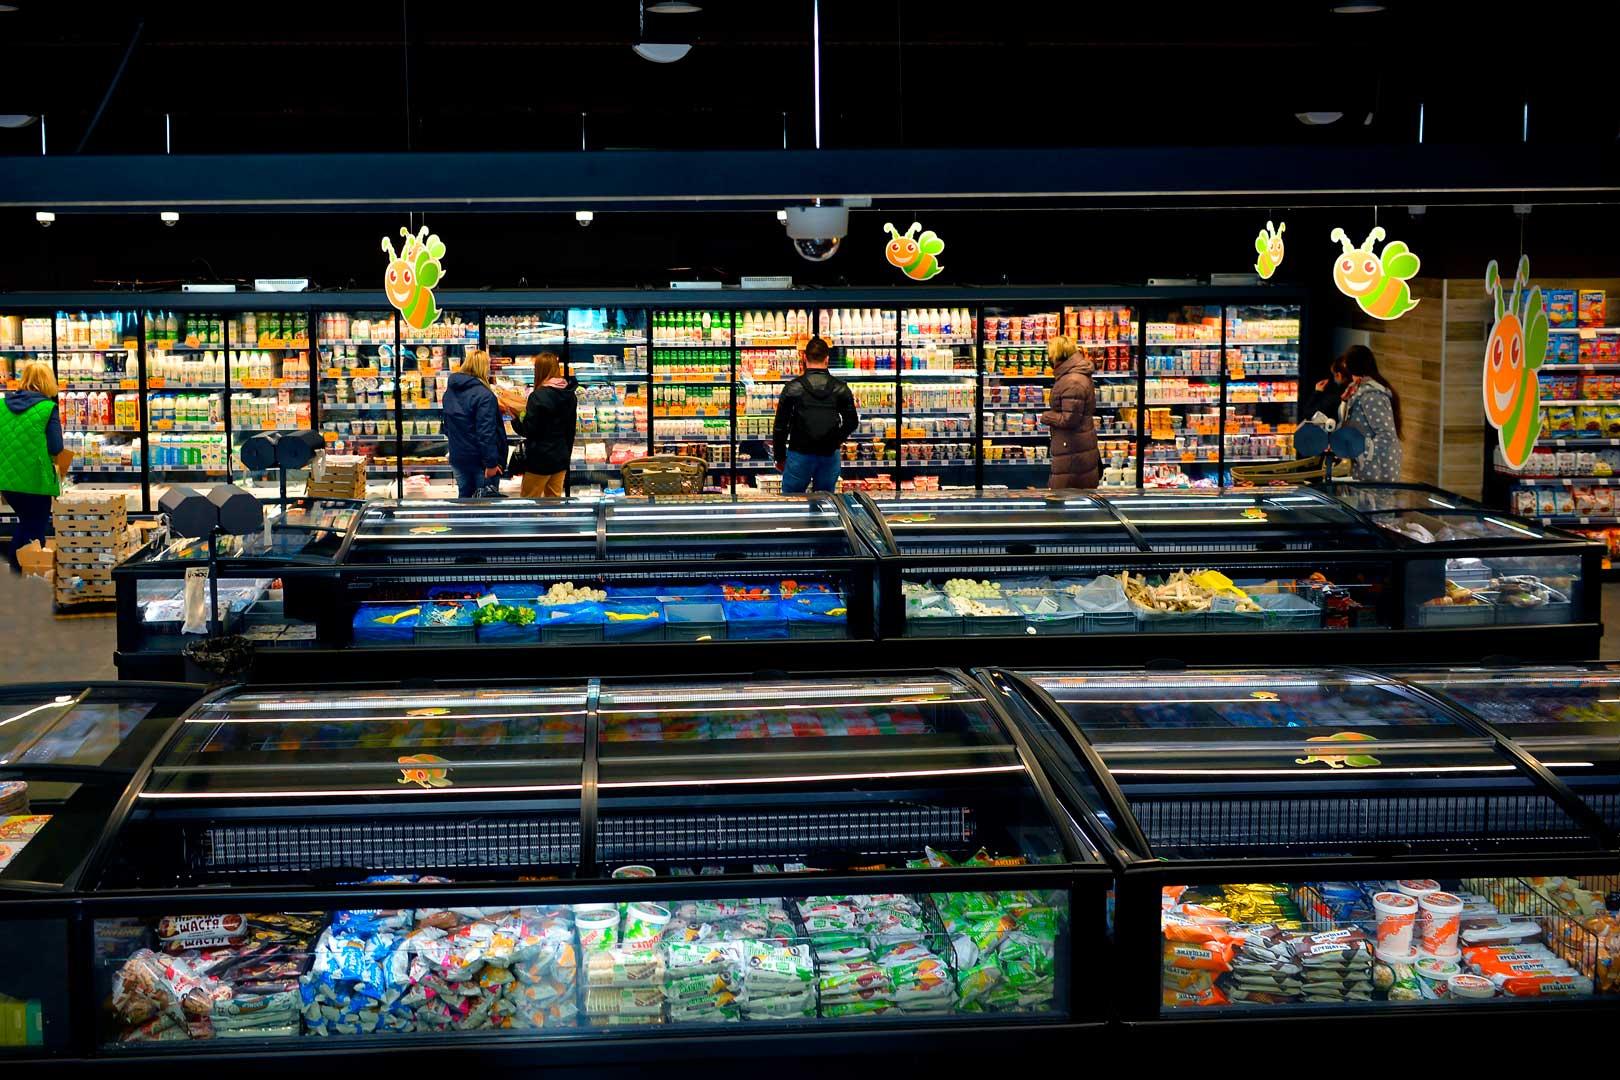 Frozen foods units Yukon AH 200 LT C 100